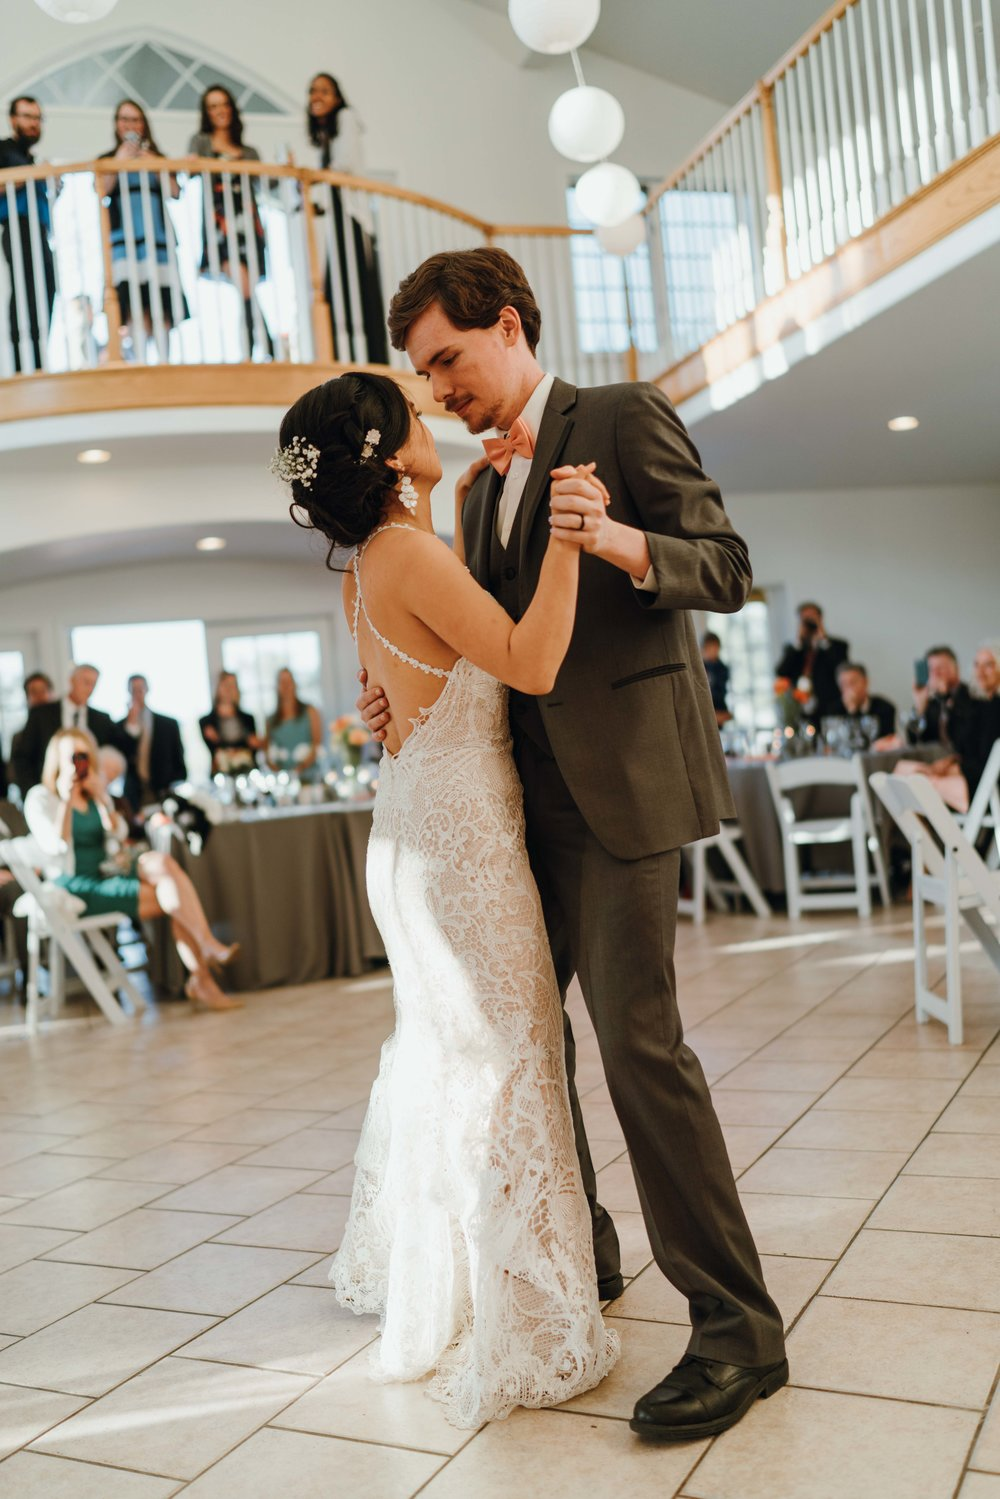 denver wedding photographer lioncrest manor in lyons ben and mali -DSC06501.jpg